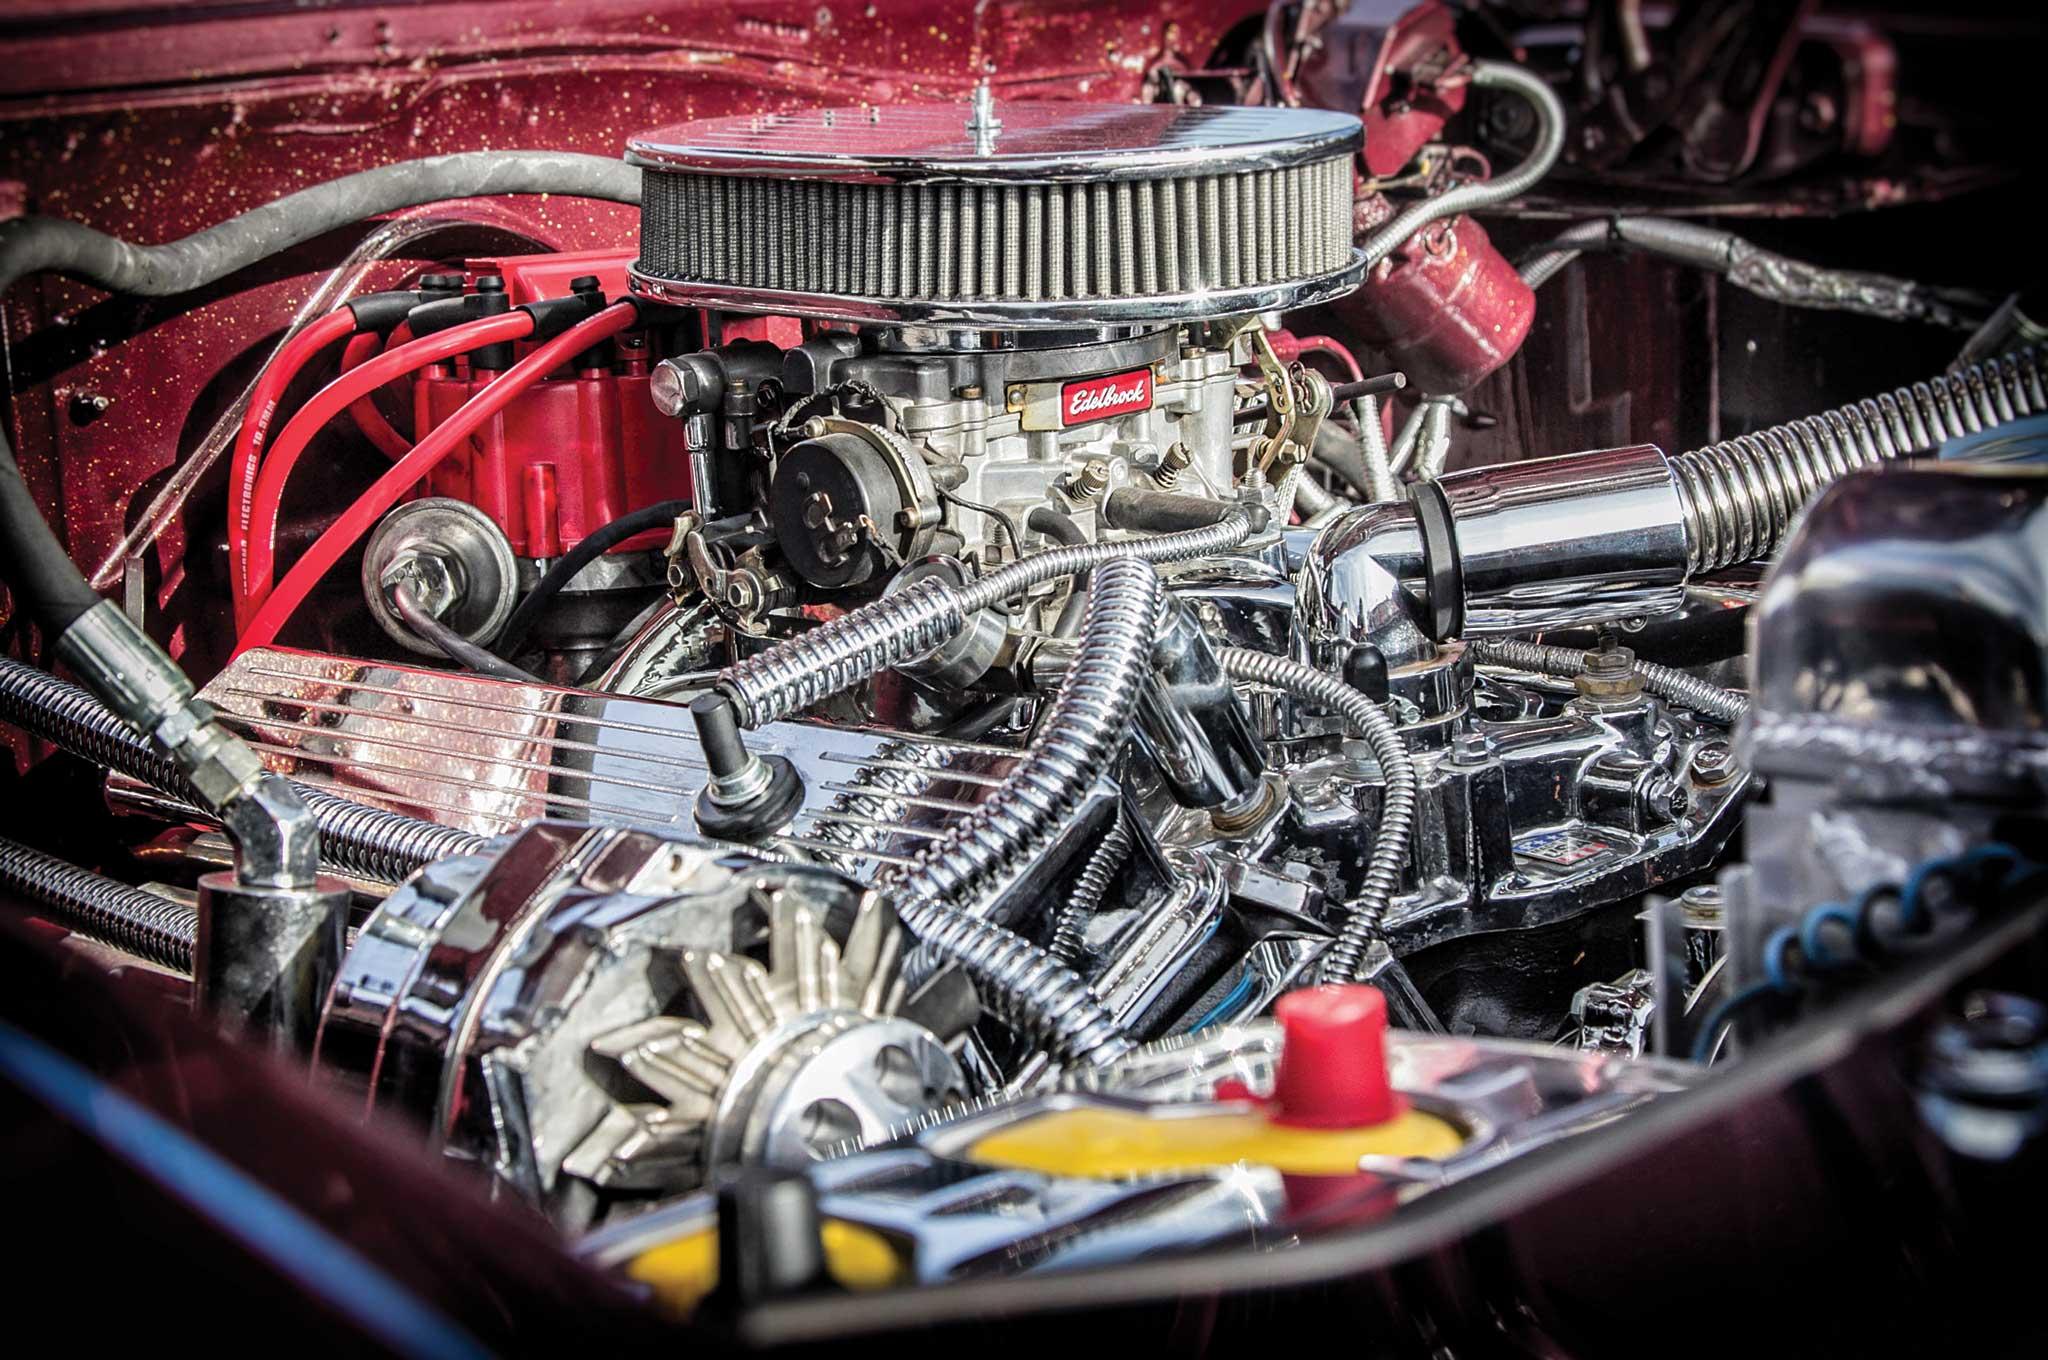 1966 Chevrolet Impala Junkyard Jewel Lowrider Chevy Accessories 5 28